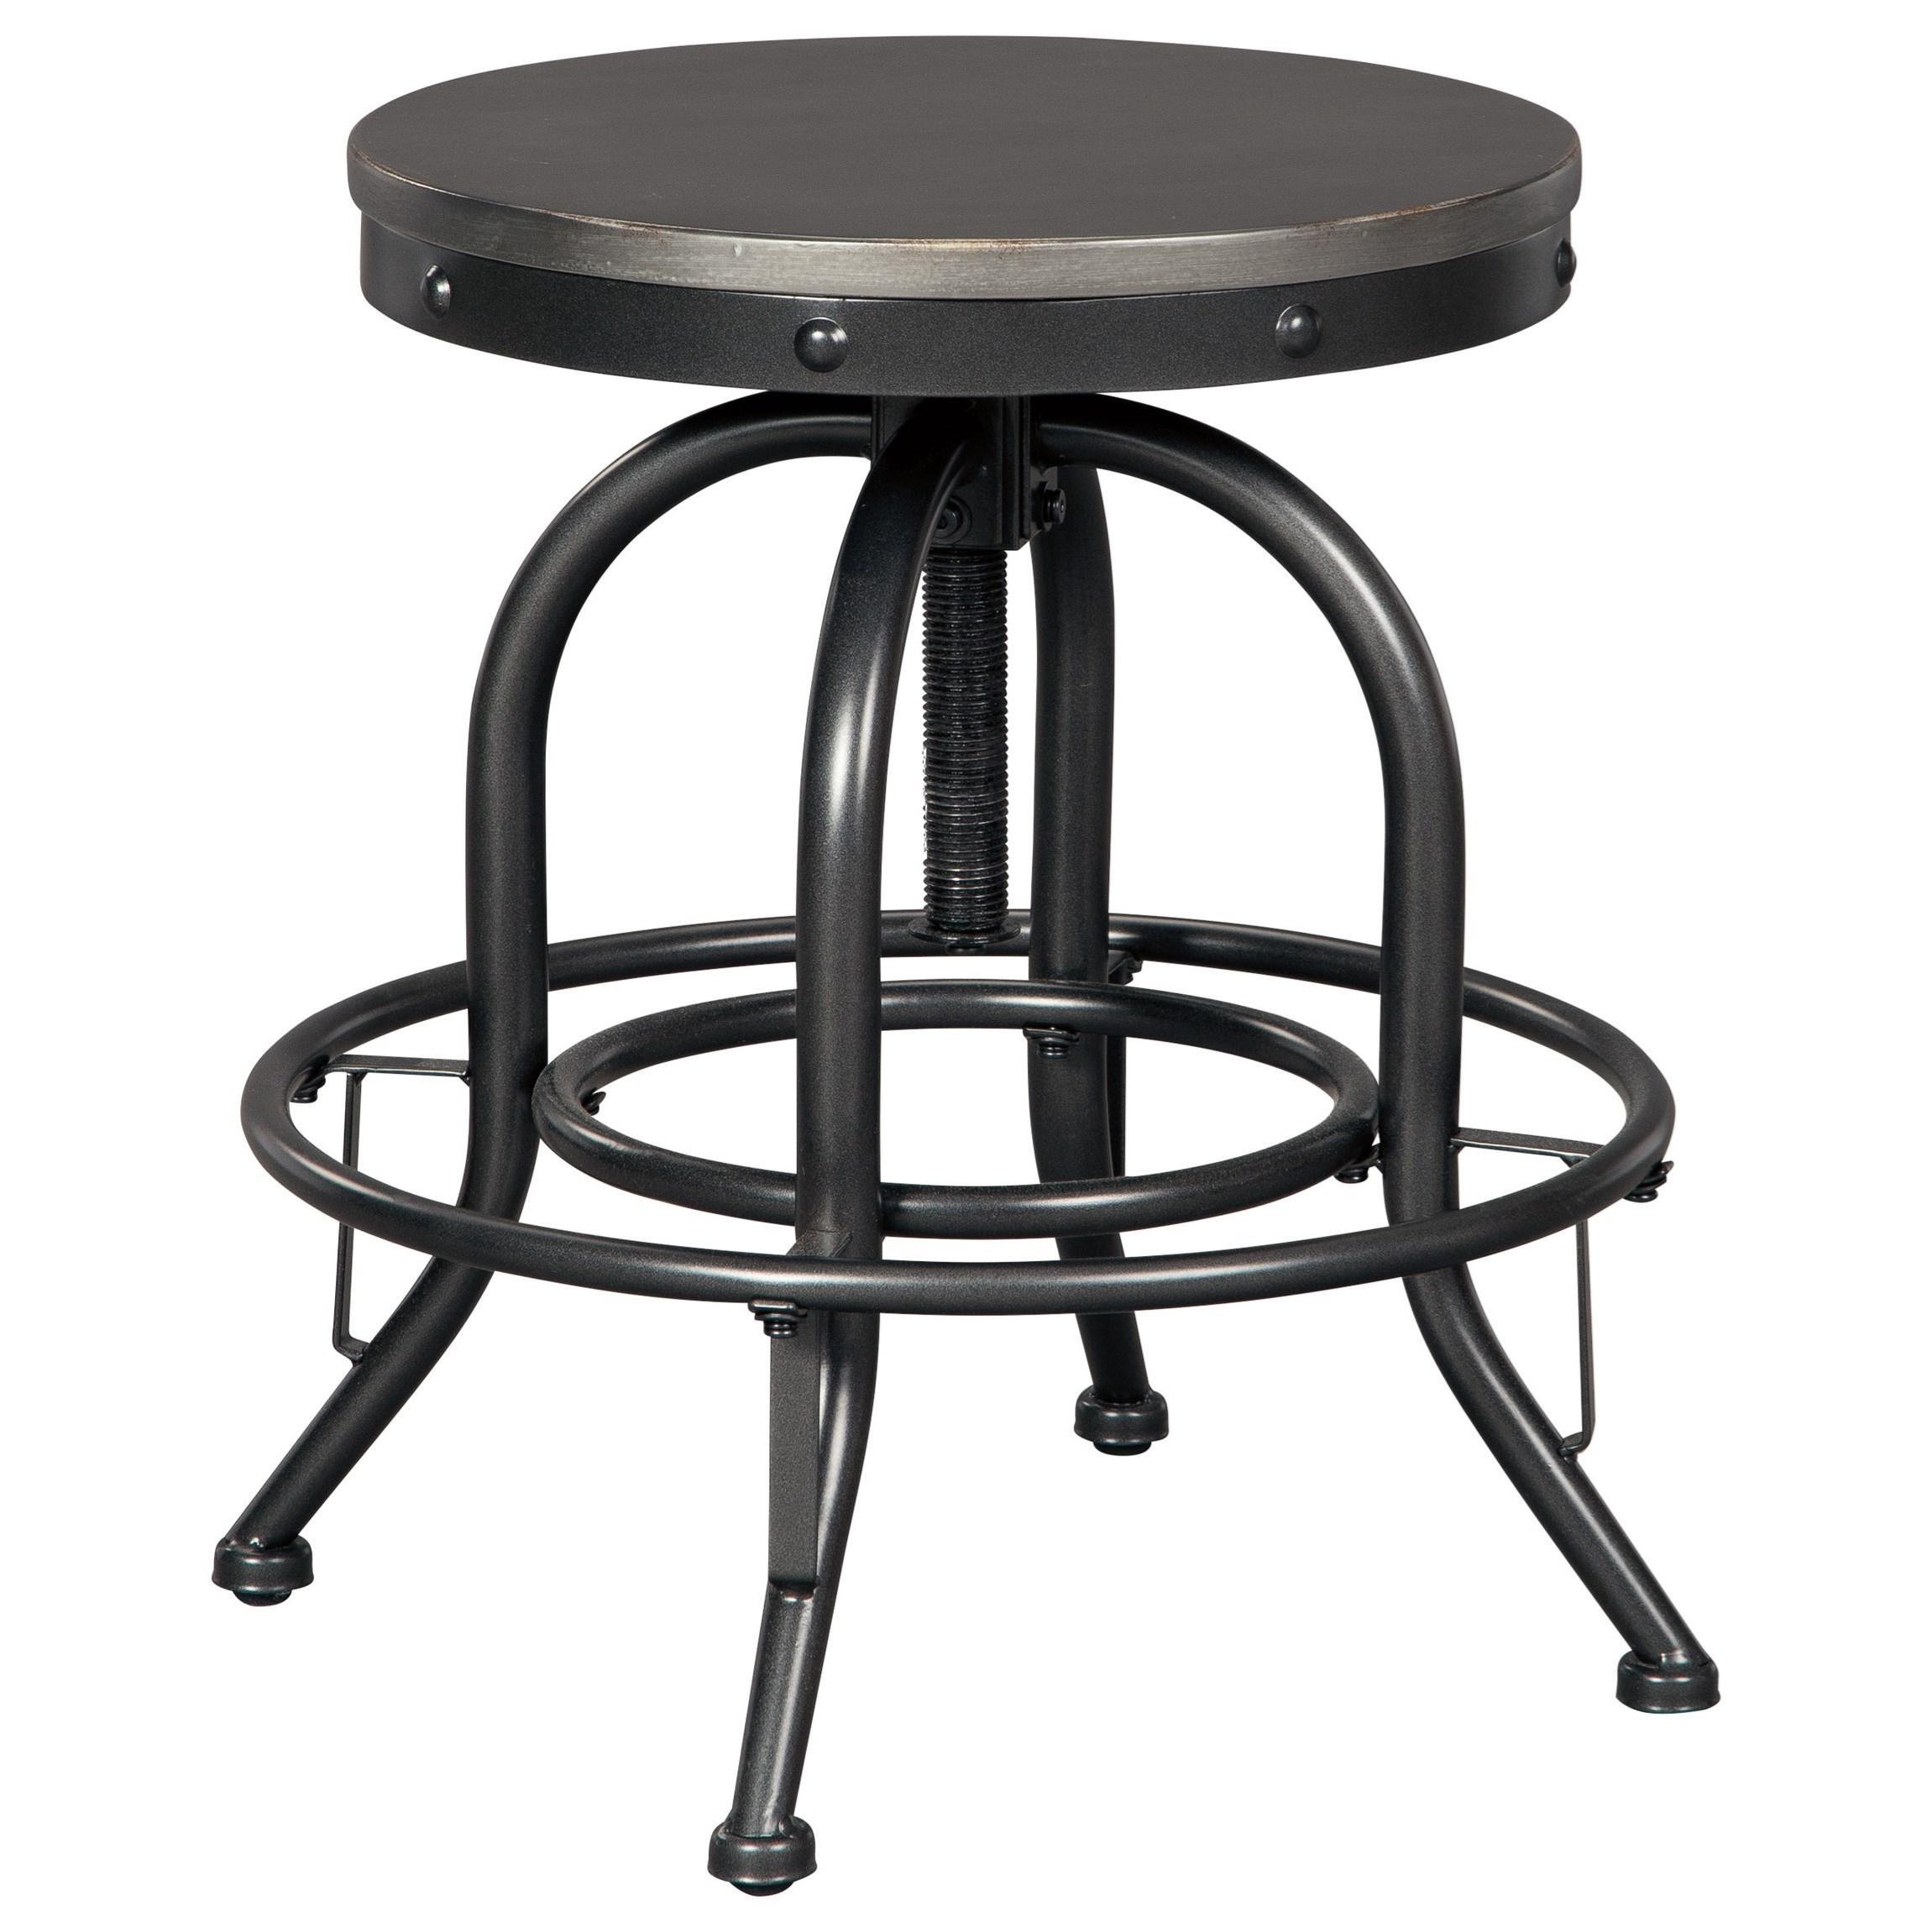 Signature Design By Ashley Minnona Adjustable Height Swivel Bar Stool Royal Furniture Bar Stools